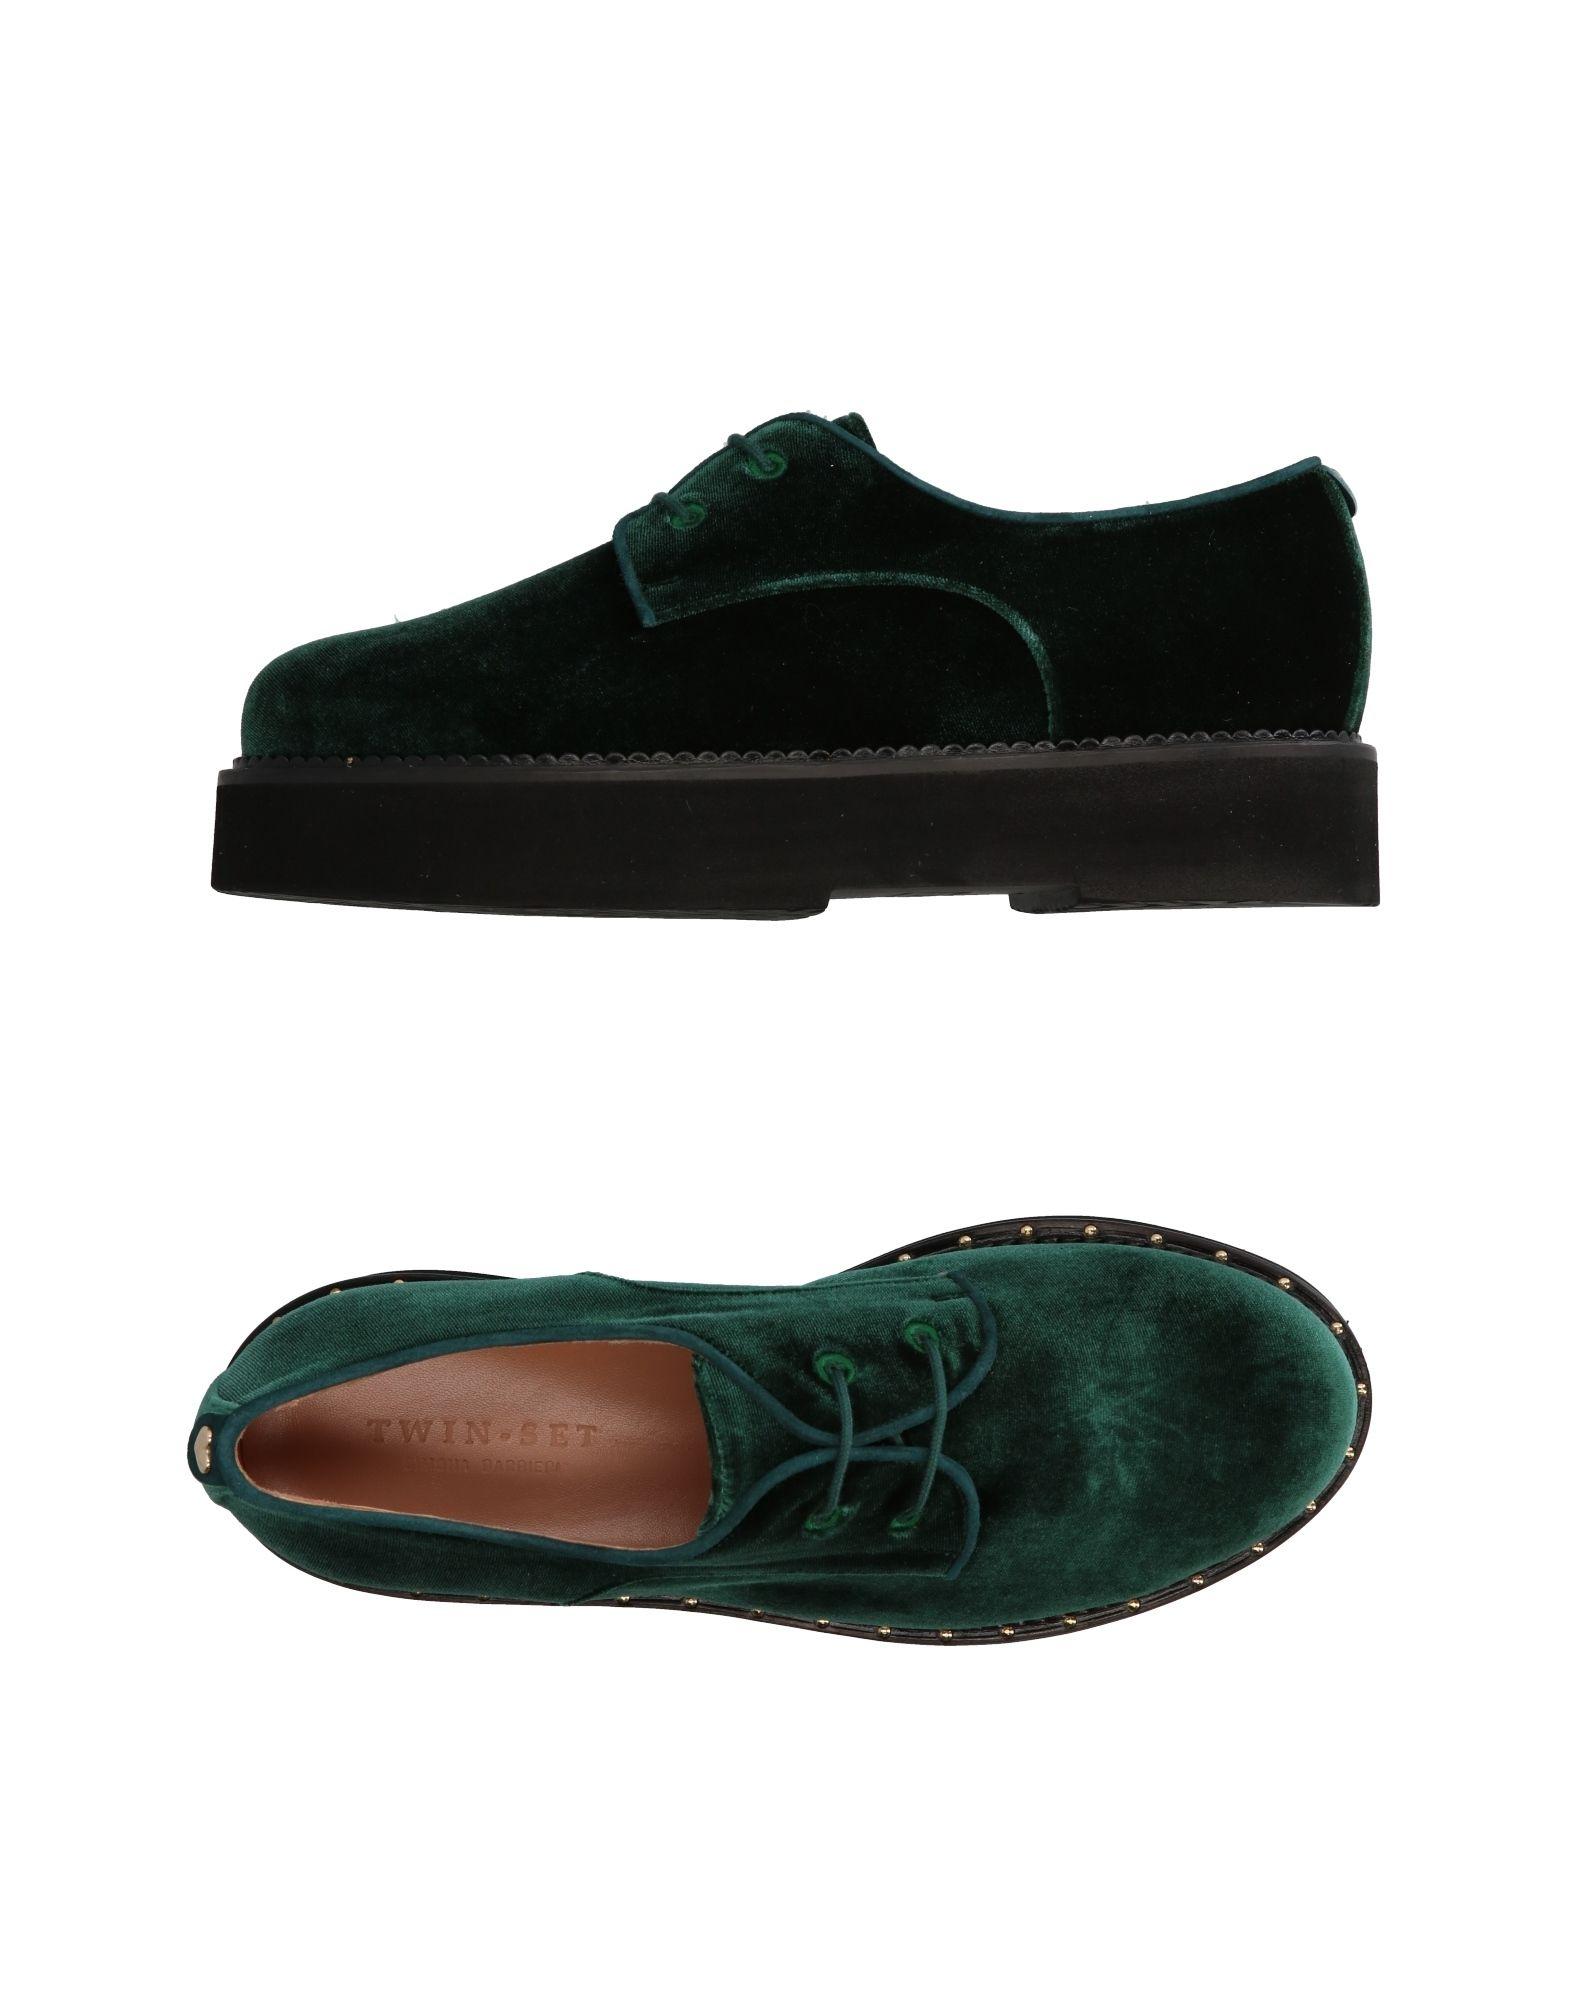 Tiempo limitado especial Zapato De Cordones Twin-Set Simona Barbieri Barbieri Simona Mujer - Zapatos De Cordones Twin-Set Simona Barbieri  Verde d35866